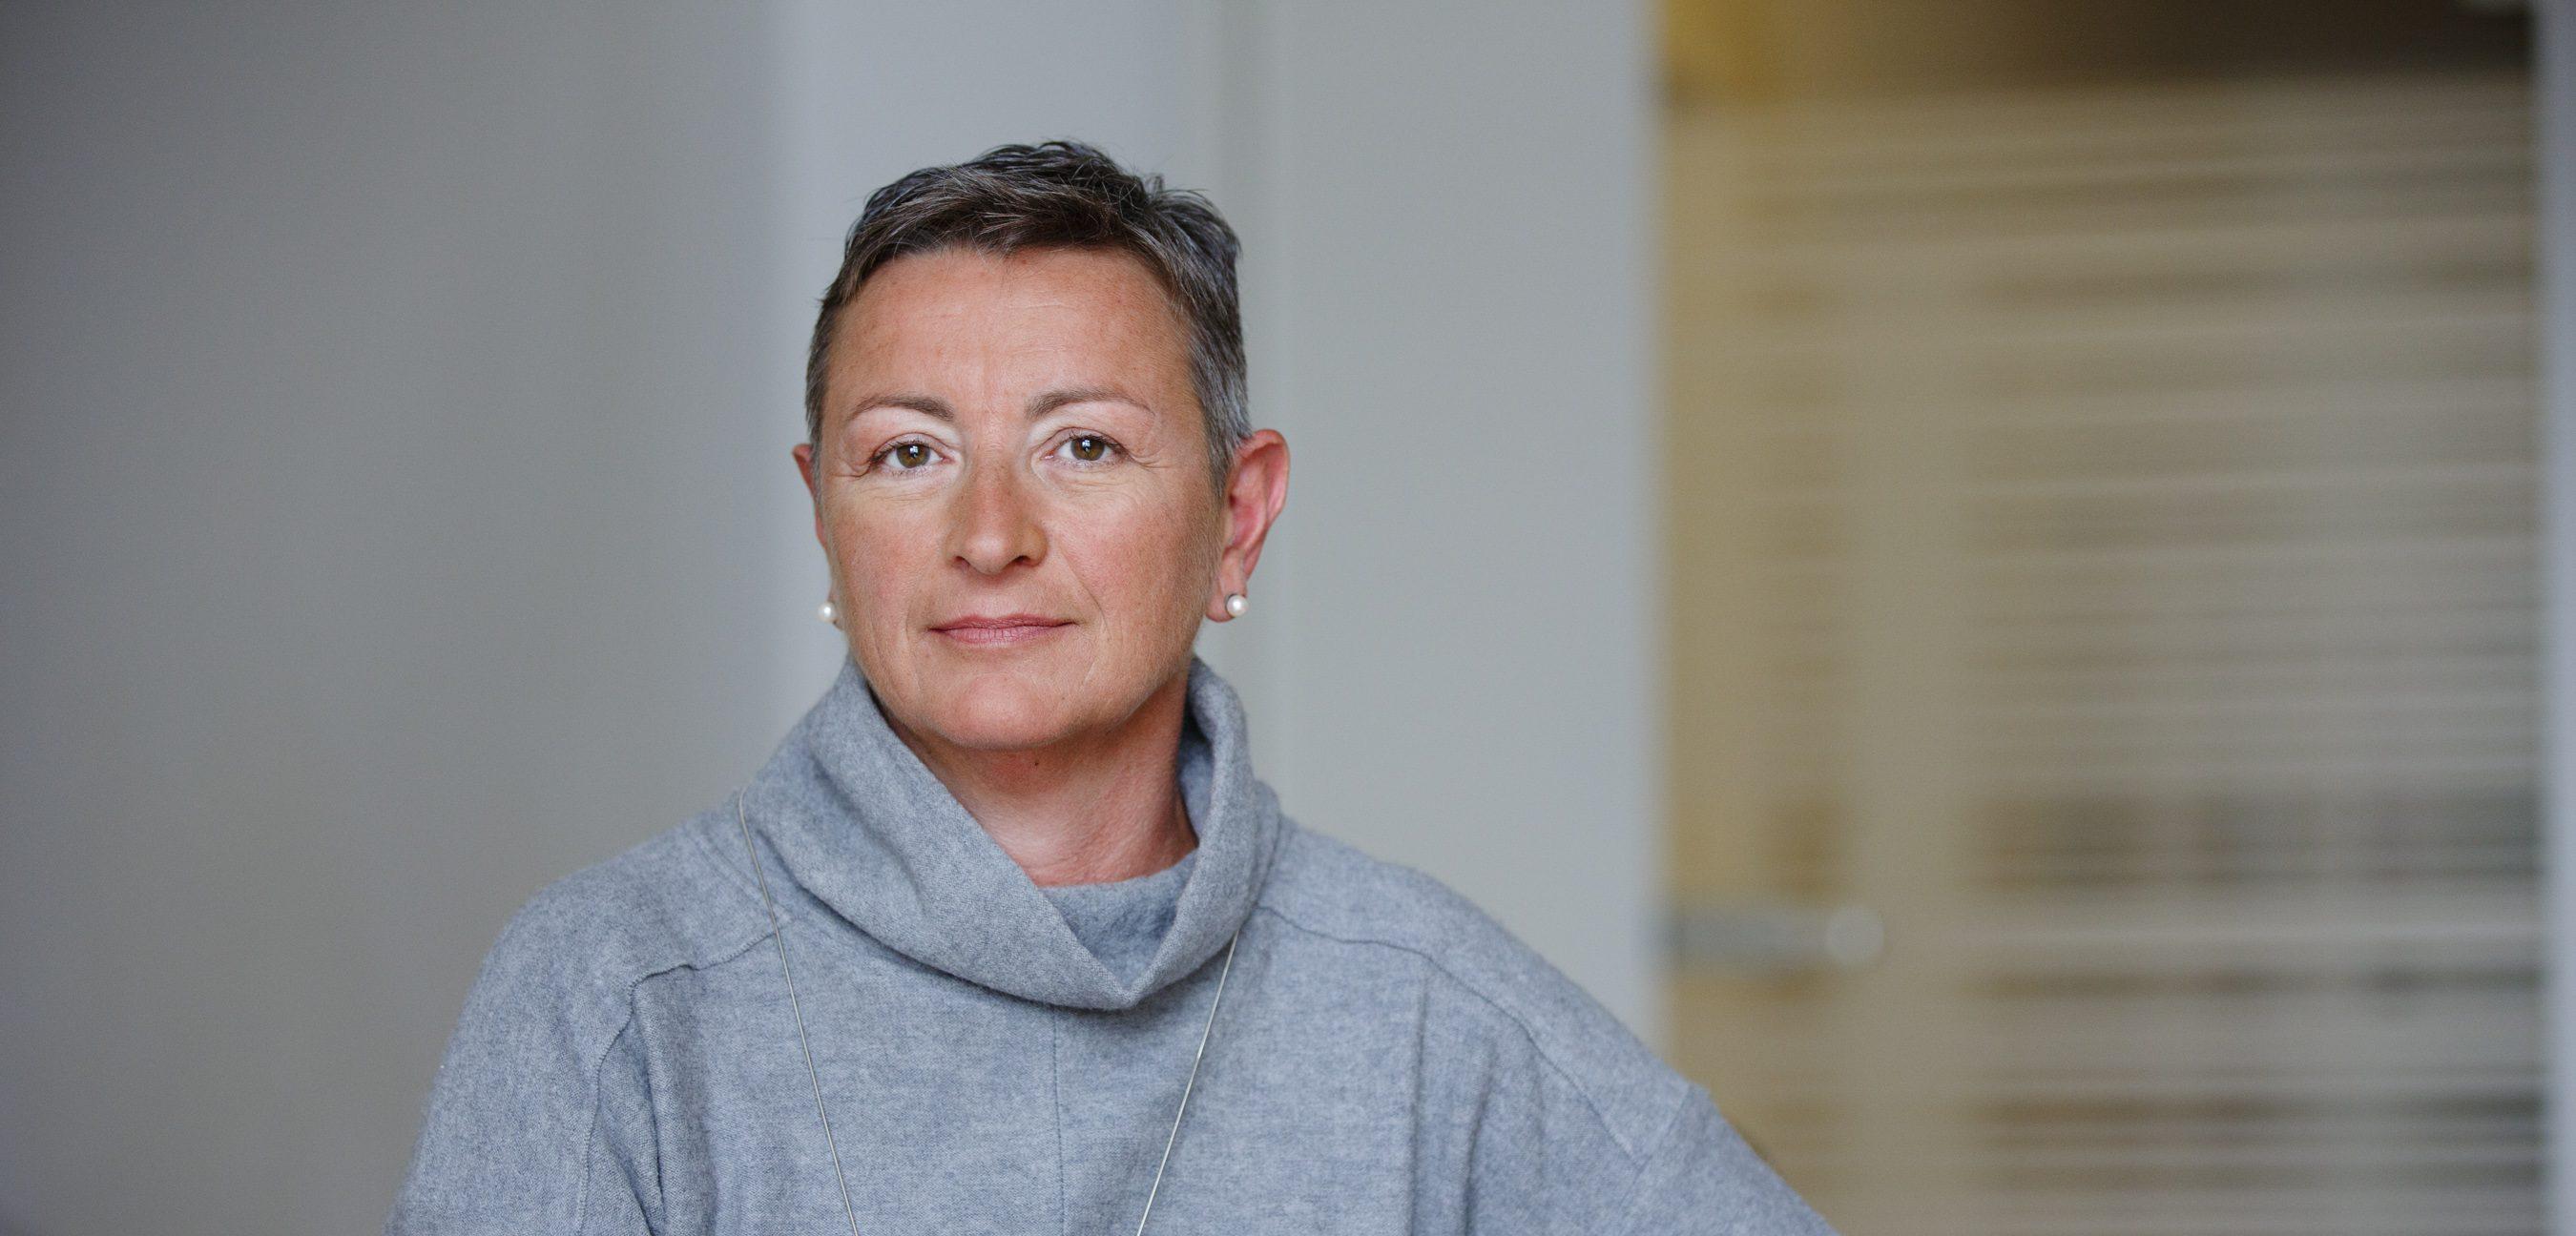 Verena Nowotny